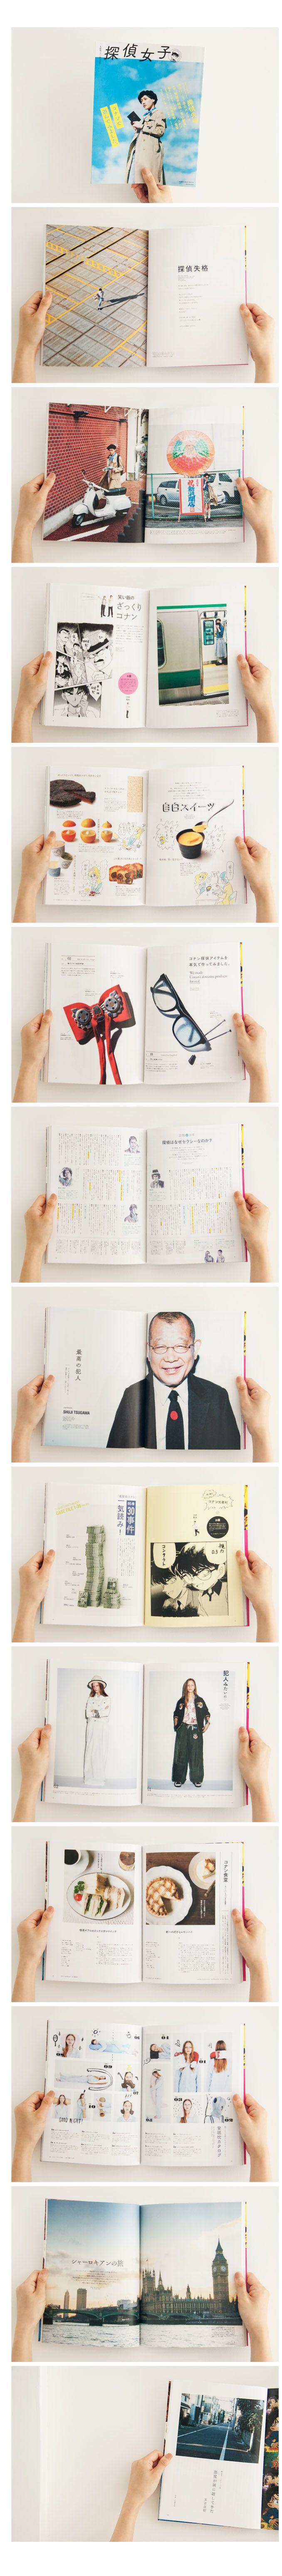 Magazine - #editorial | #layout | #moderndesign